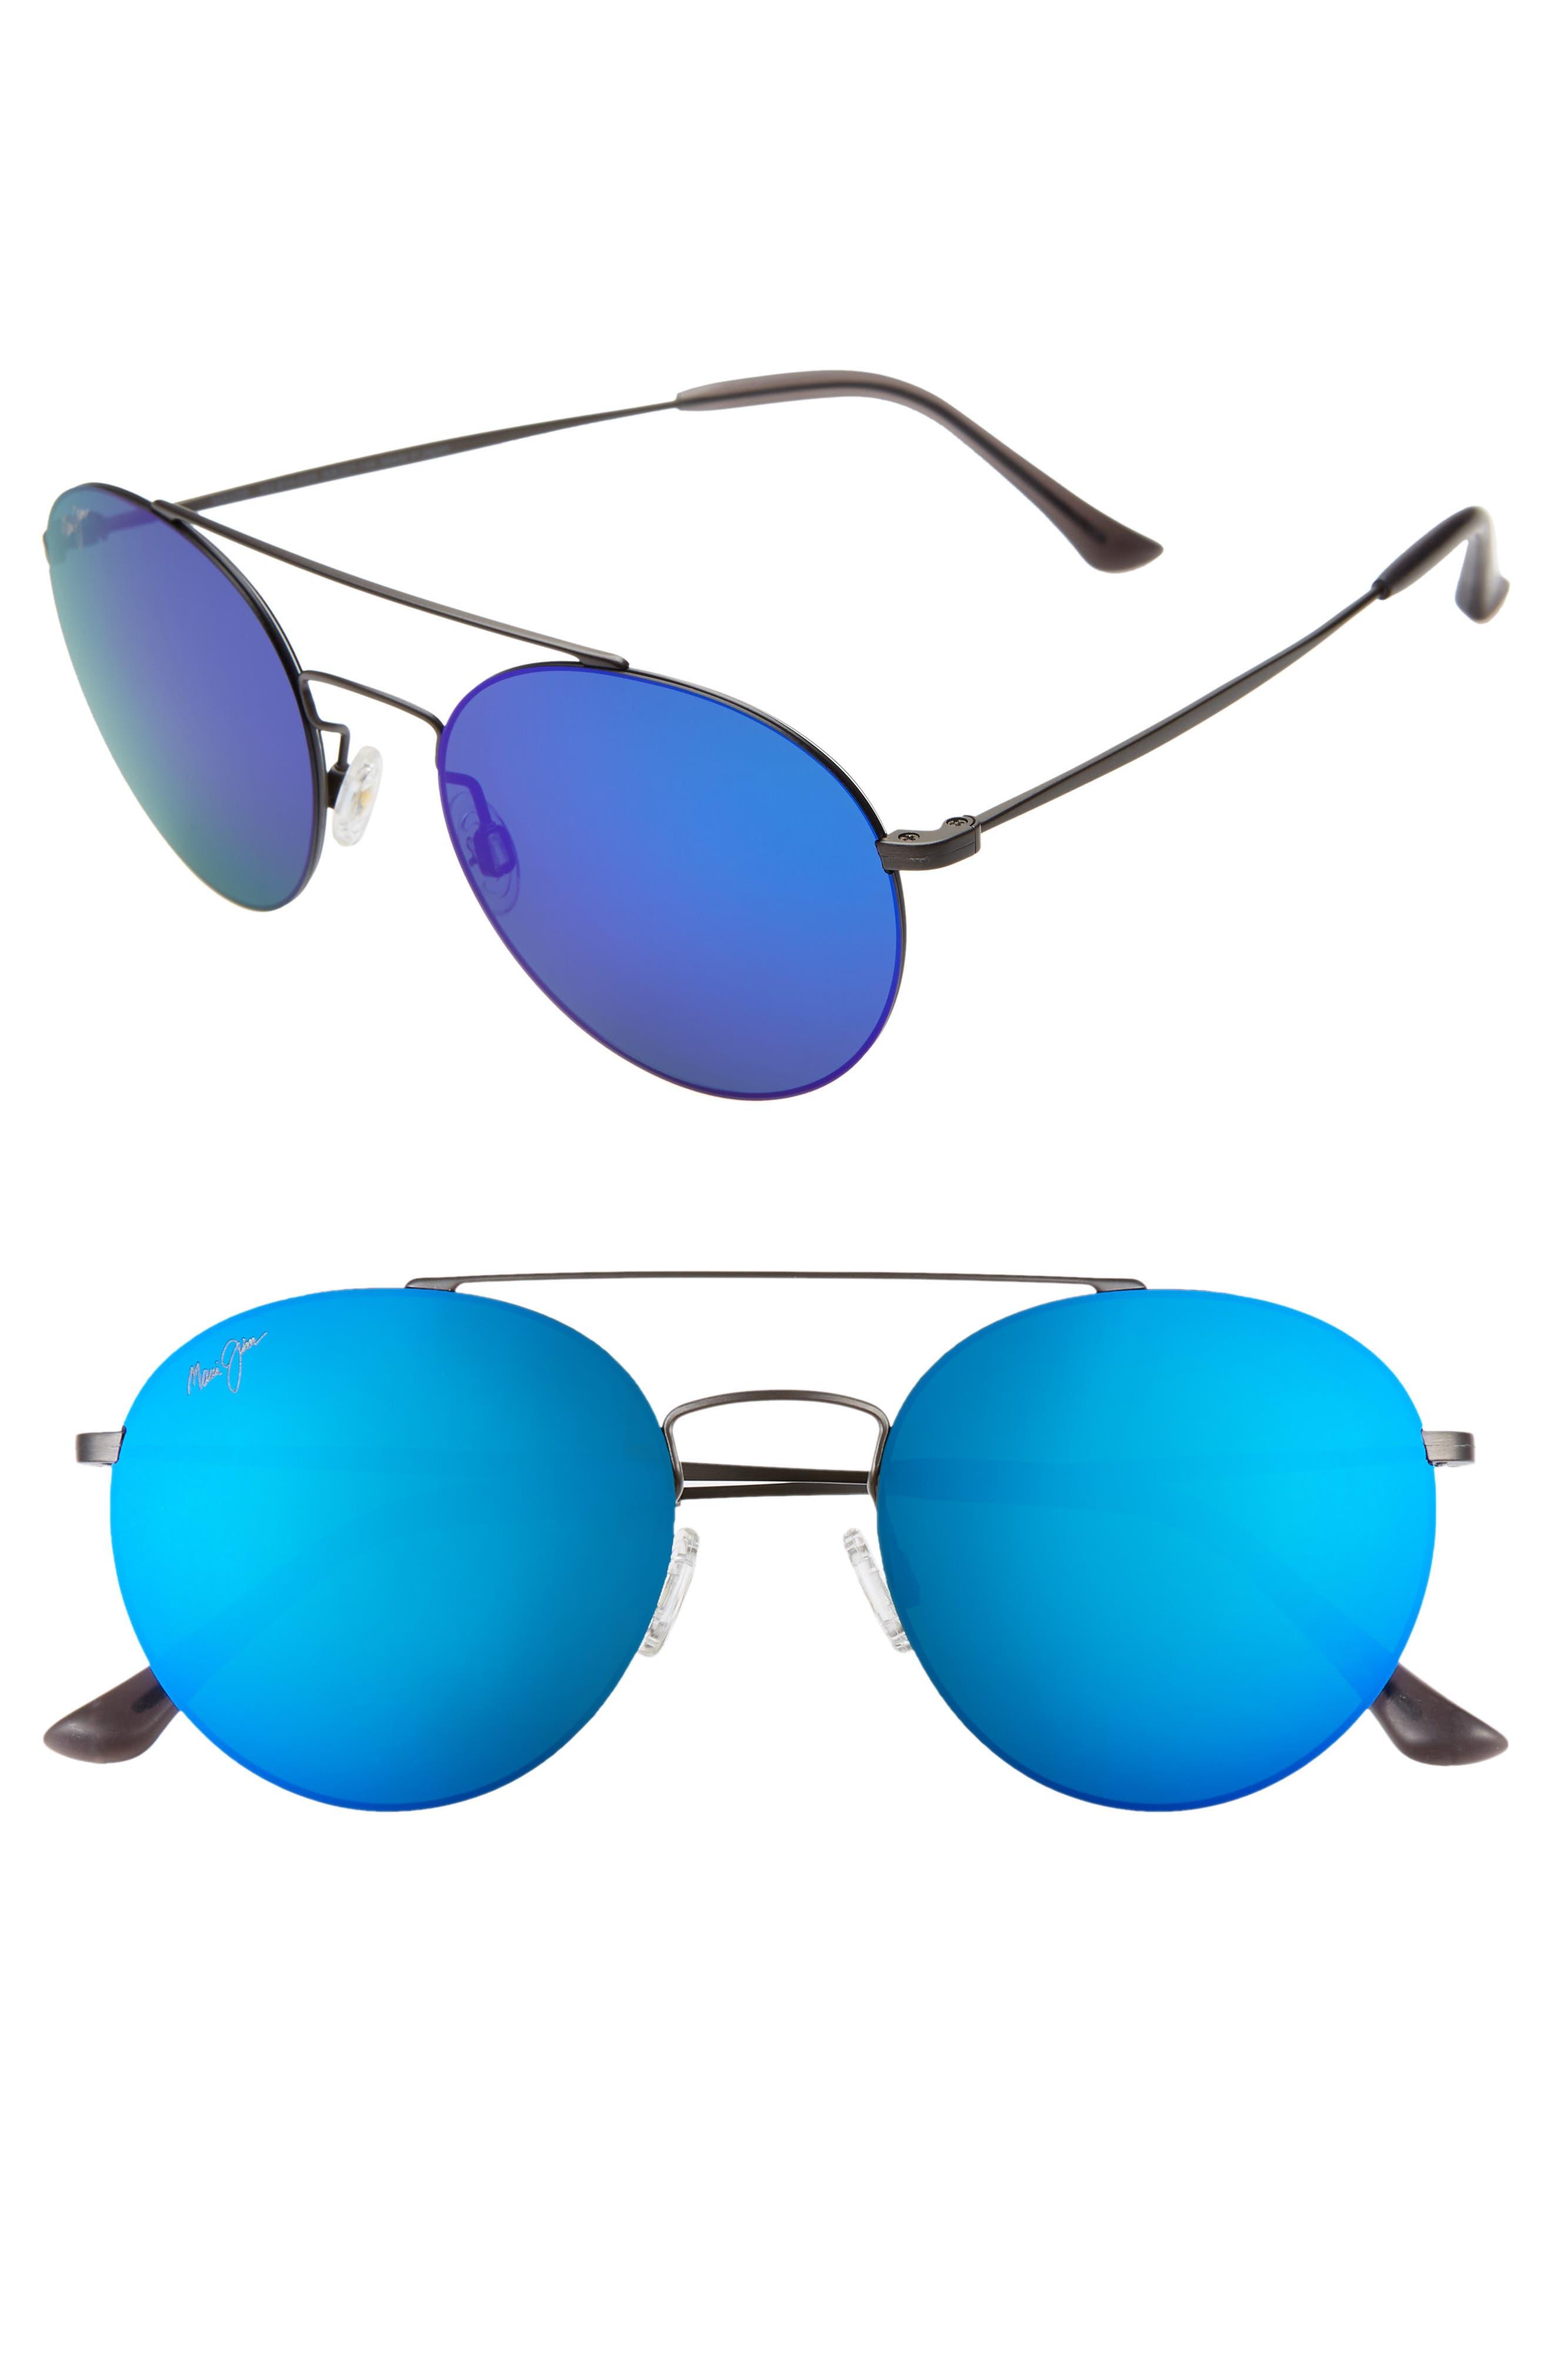 Pele's Hair 53mm Polarizedplus2 Round Flat Front Sunglasses